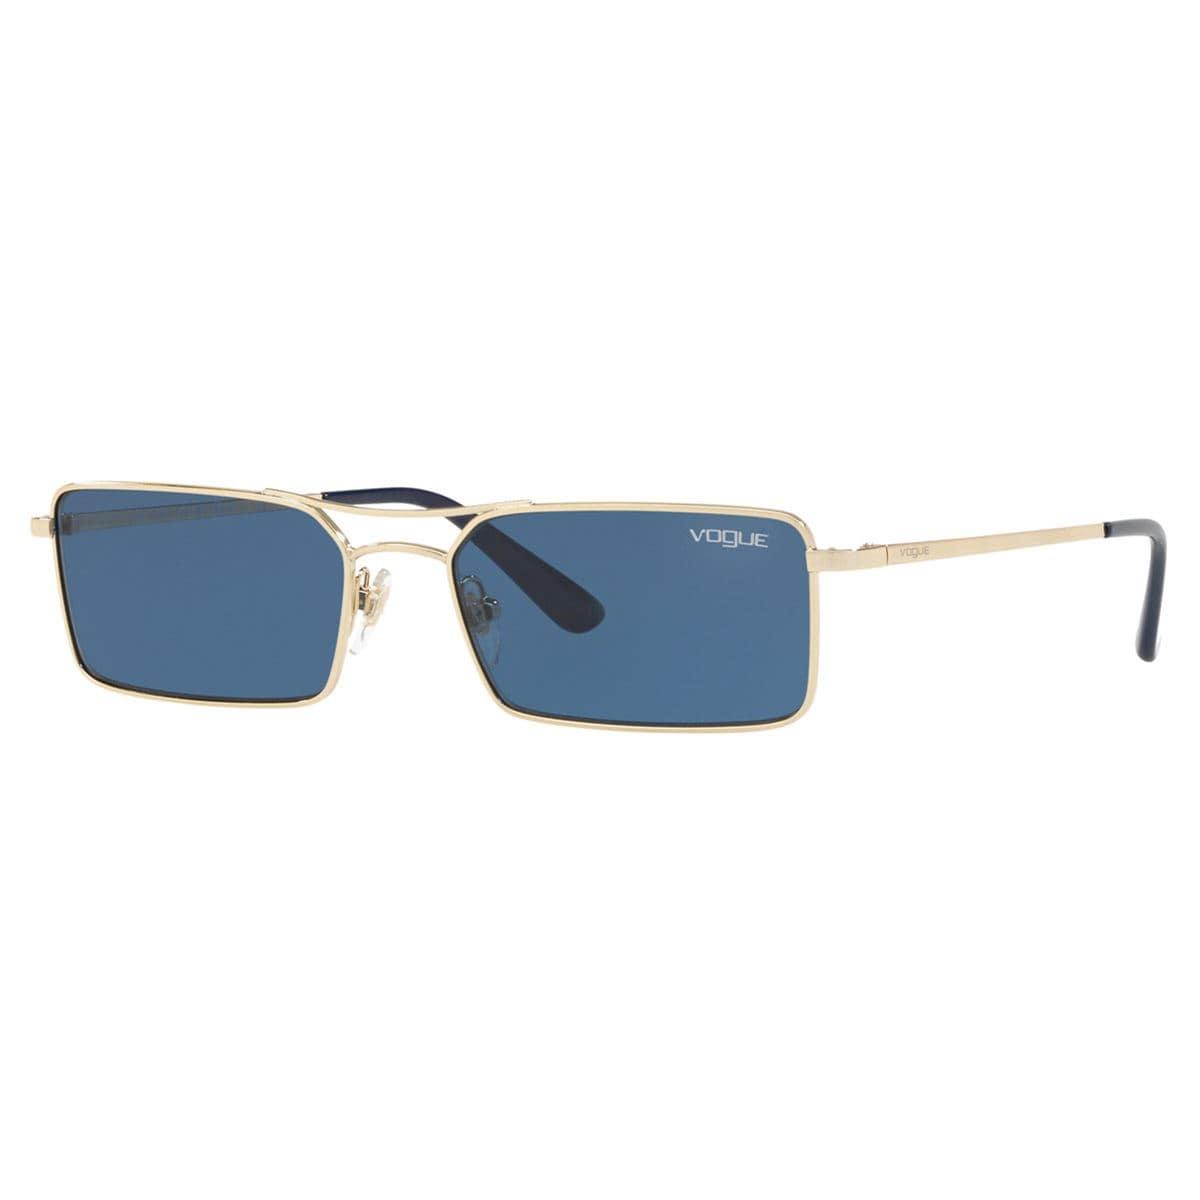 Vogue azul armazón en metal oro pálido